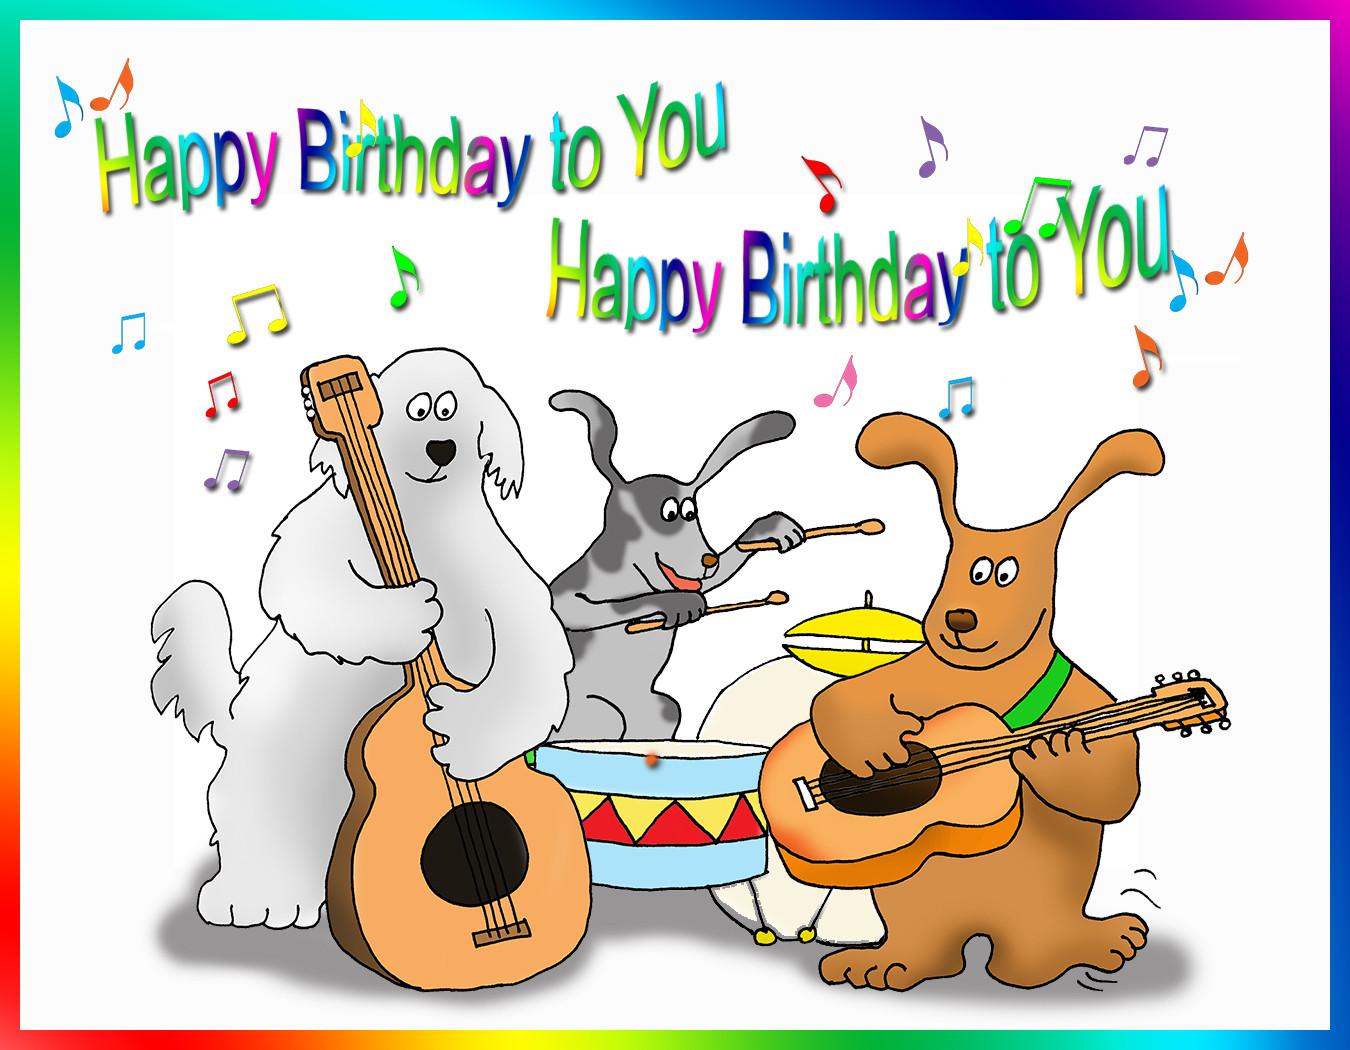 Free Printable Birthday Cards Funny  Happy Birthday Card for You – Free Printable Greeting Cards